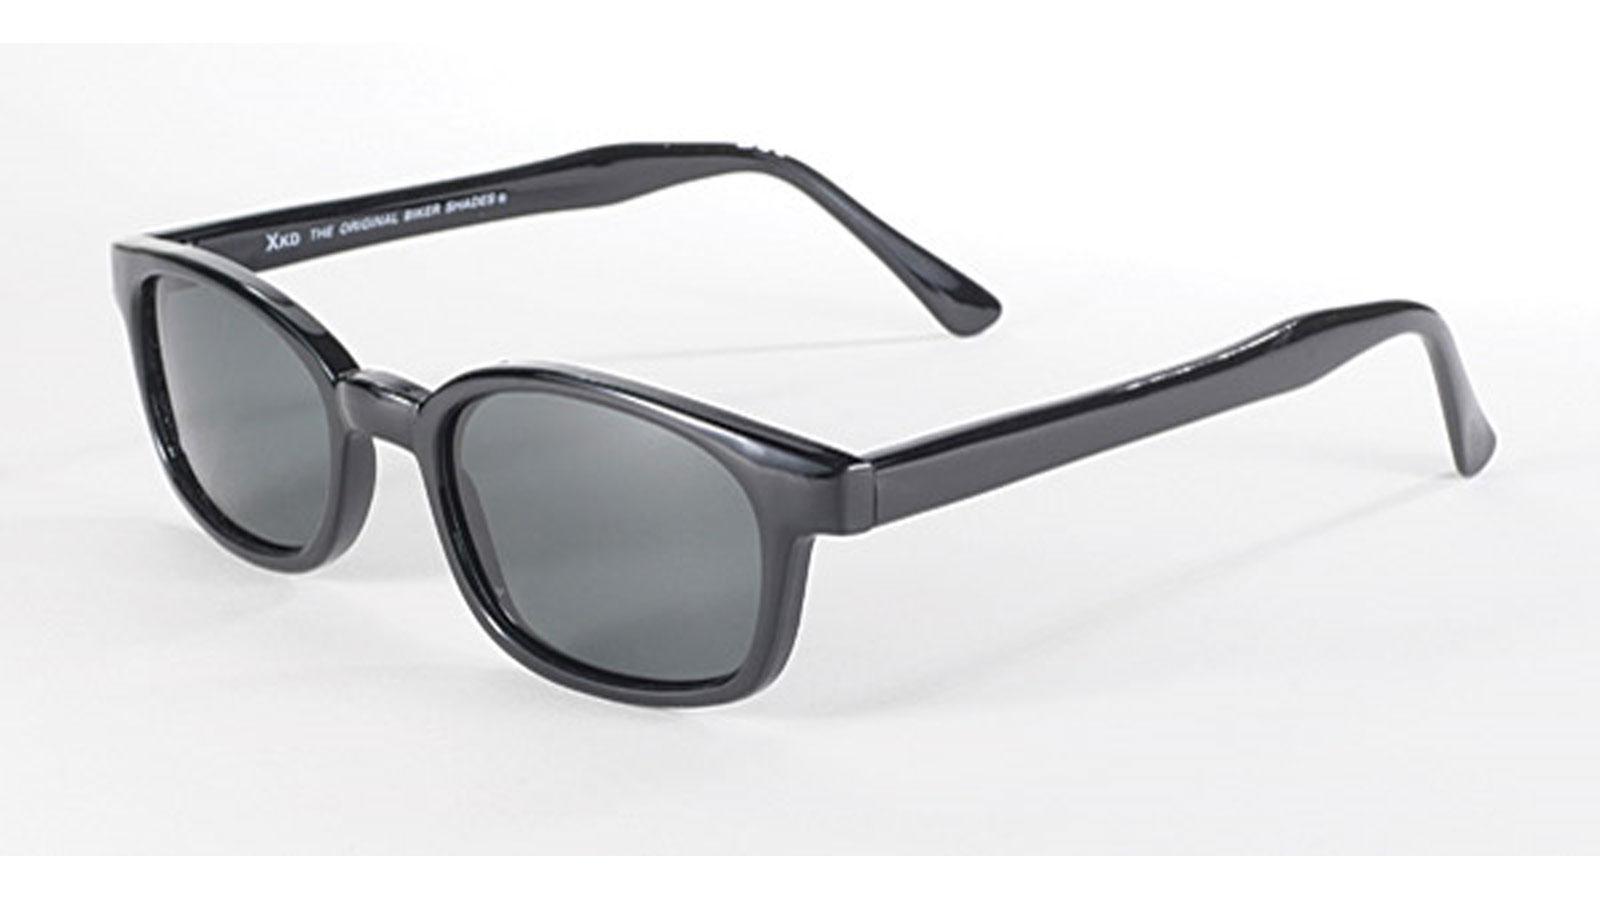 Fitovers Eyewear AVIATOR MBLK|AMBR LG